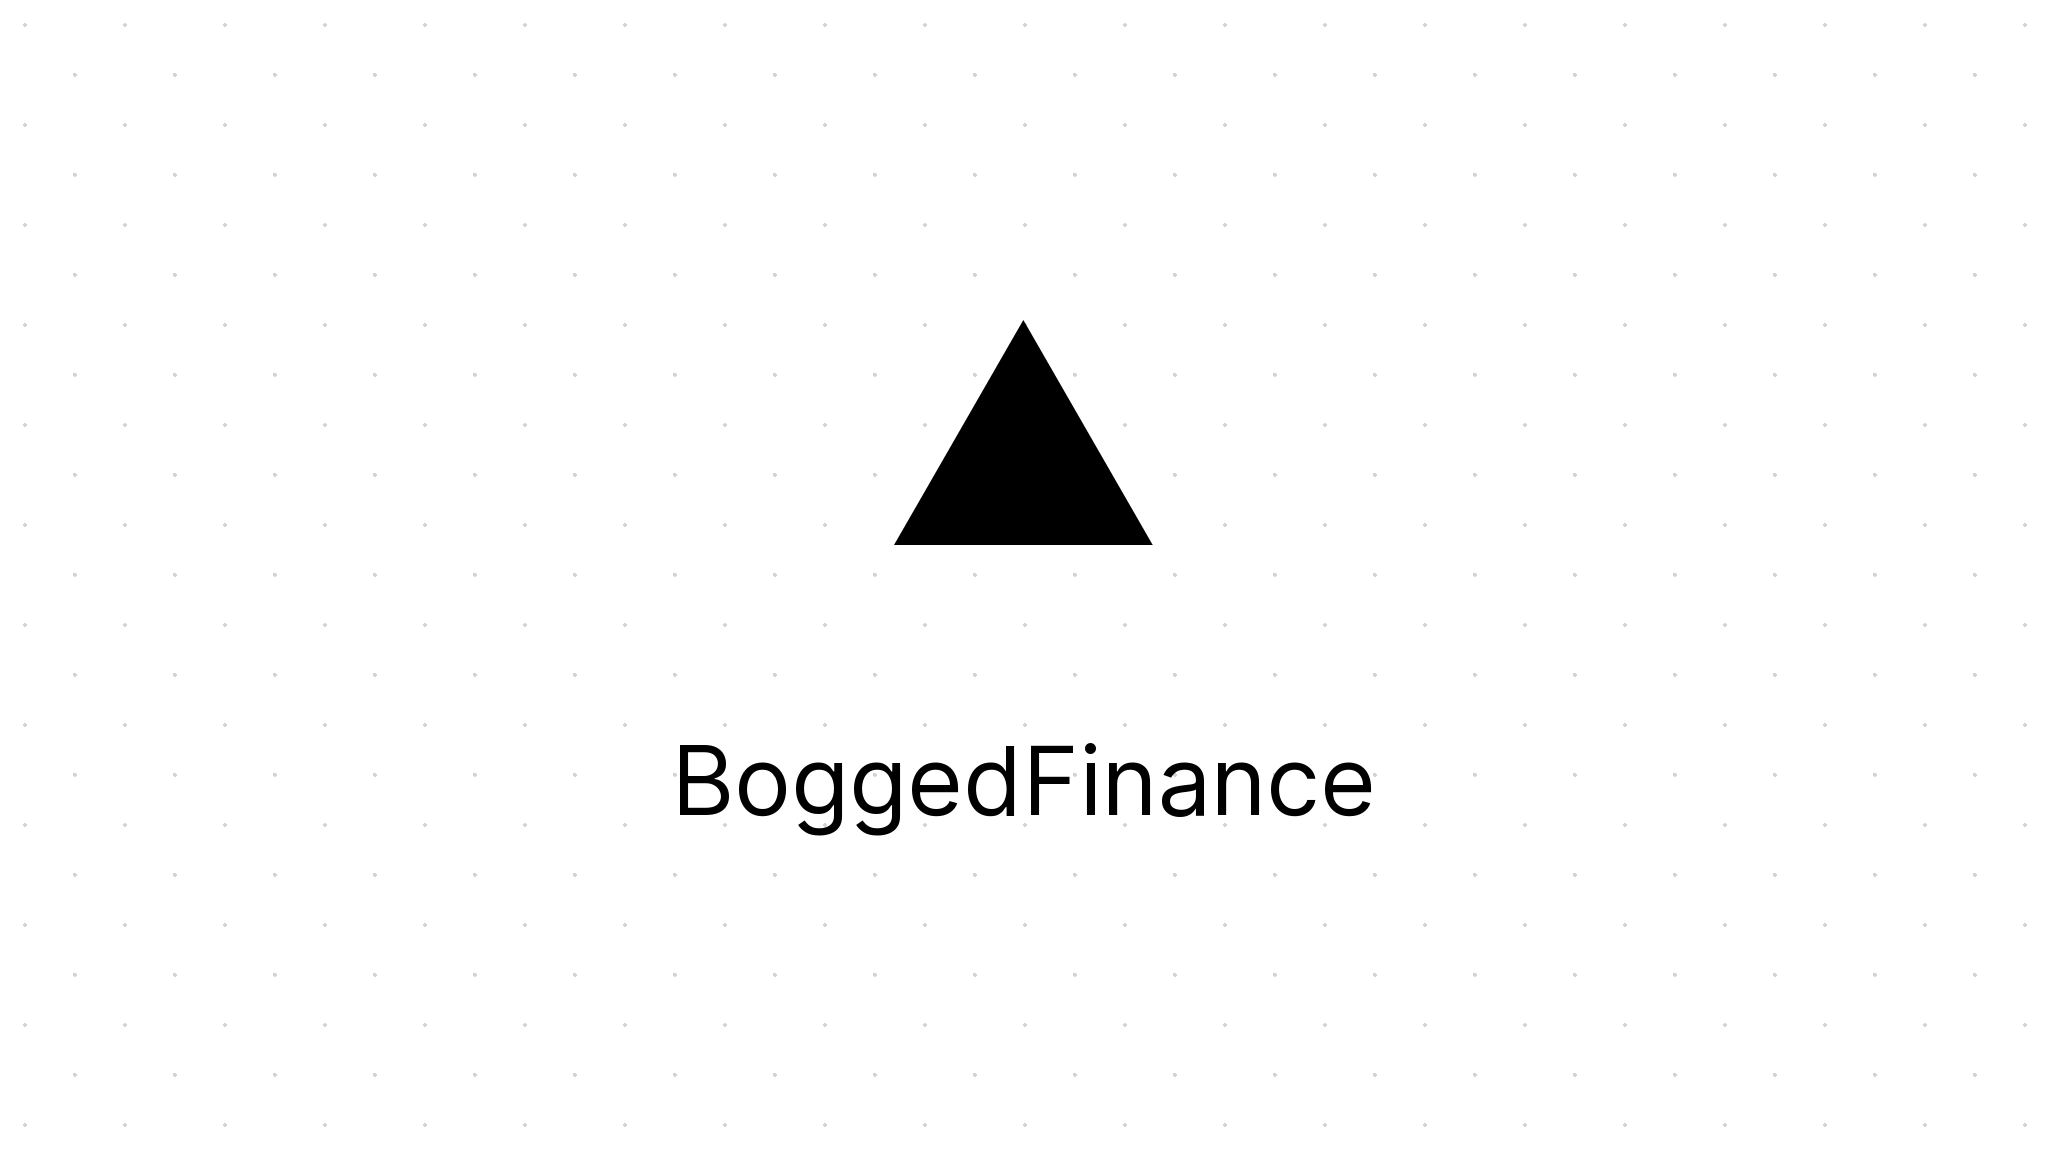 bogged.finance